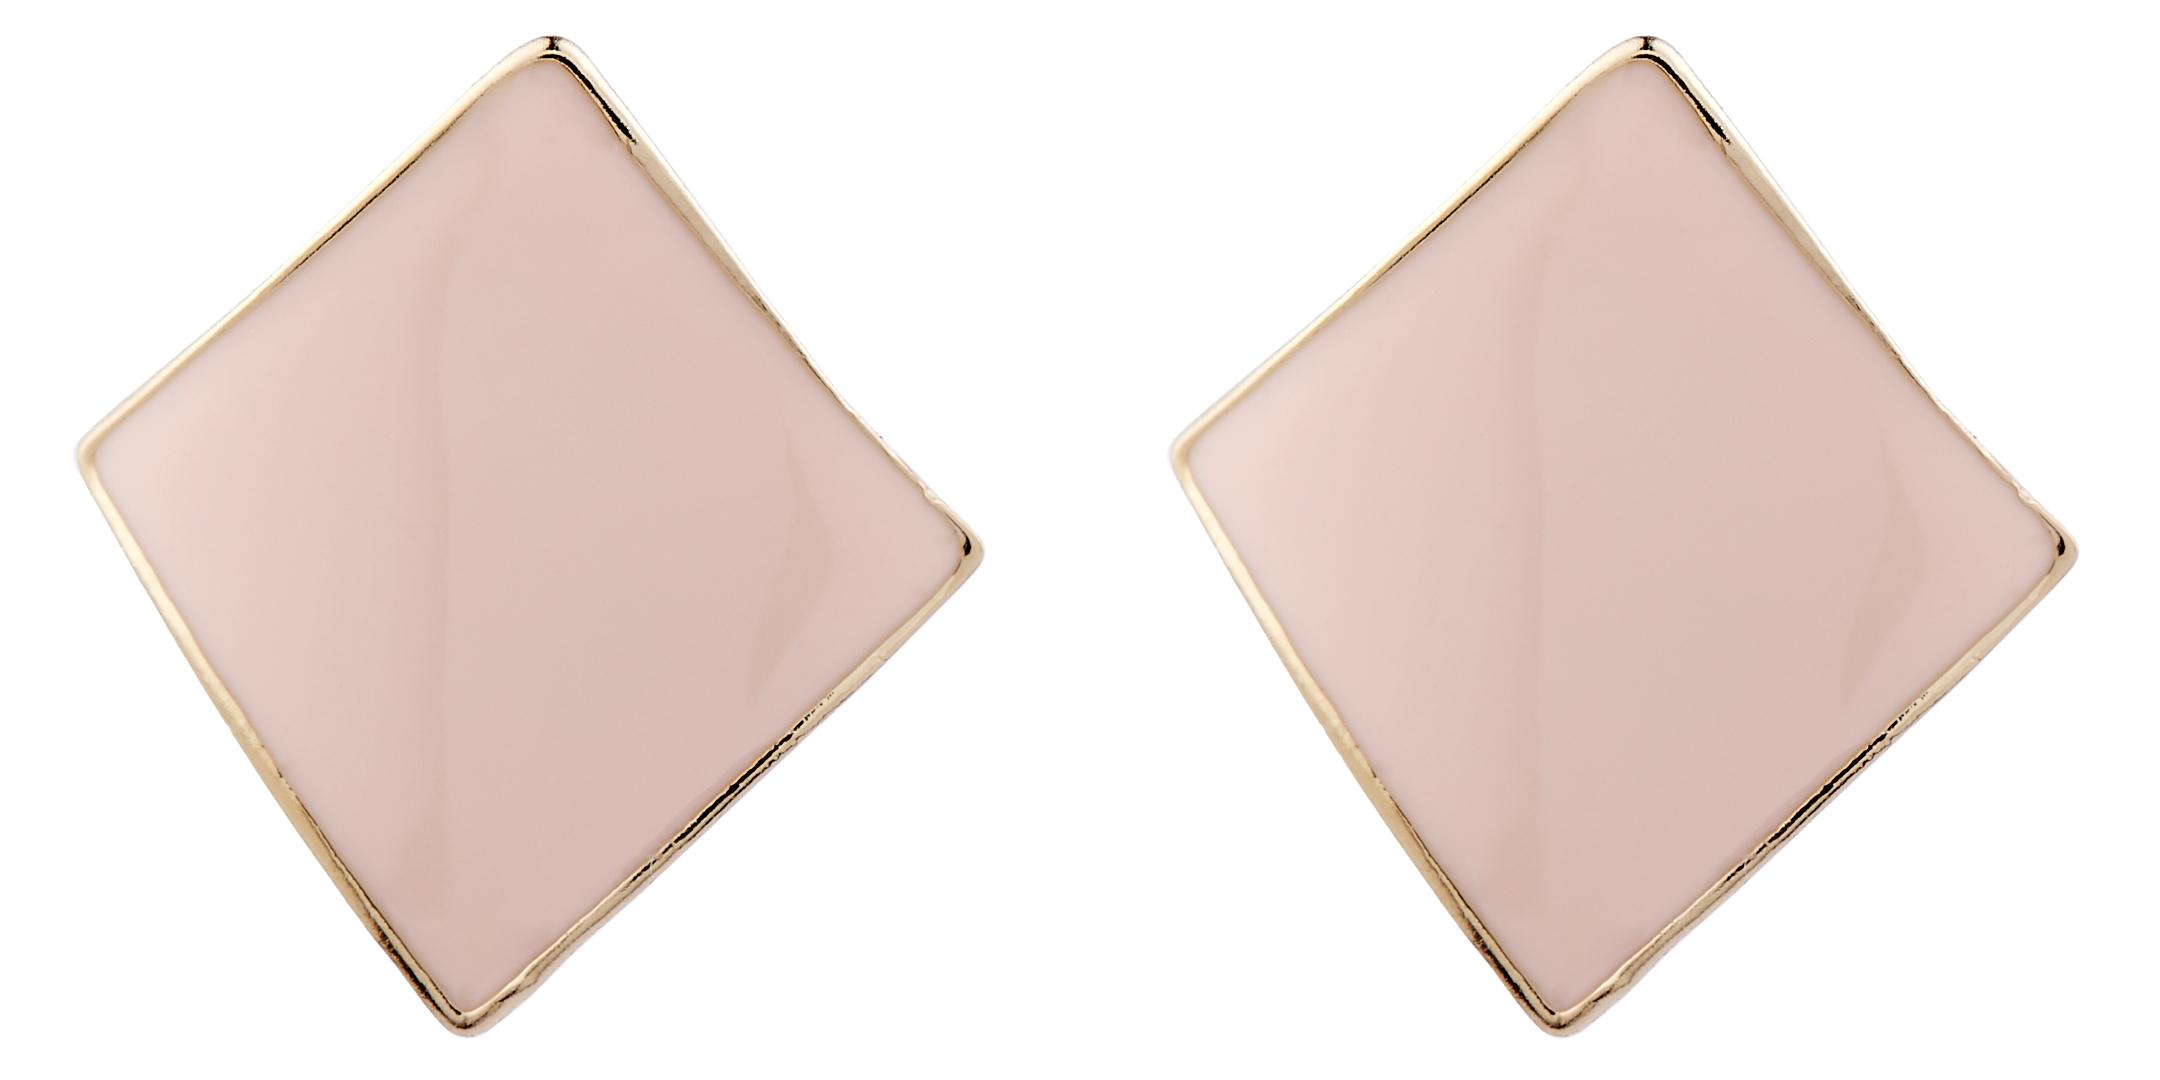 Clip On Earrings - Billie P - gold stud earring with pink enamel